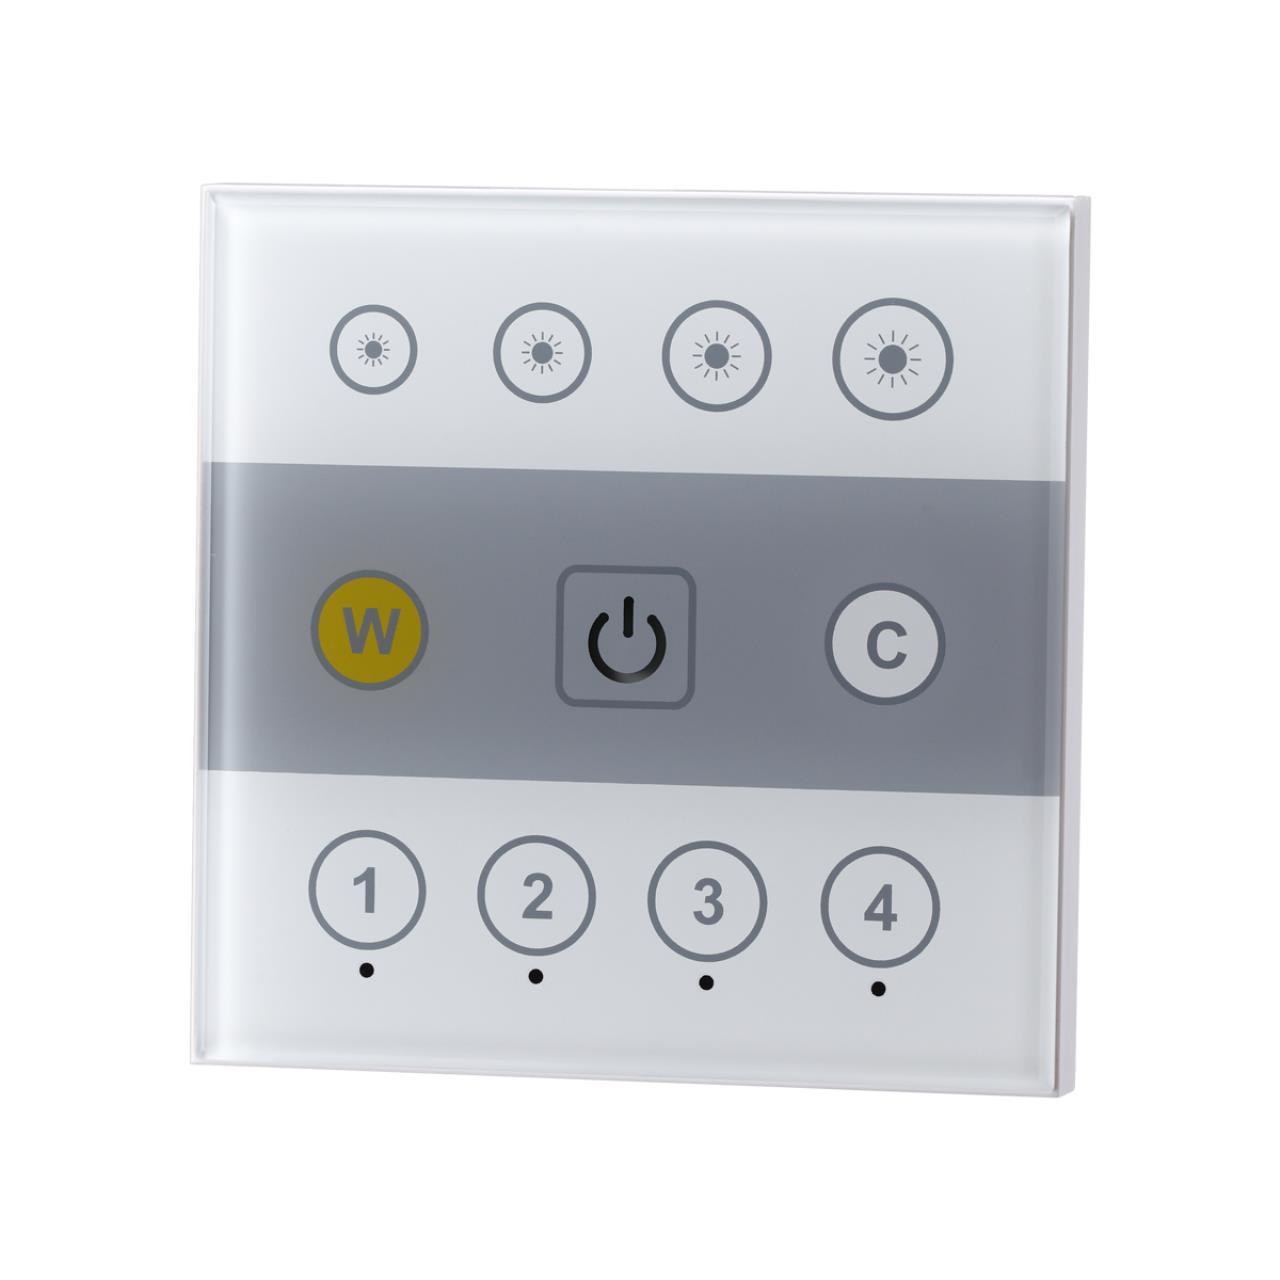 358340 PULT NT19 000 белый Настенная панель ДУ (2.4G) IP20 90-265V GESTION